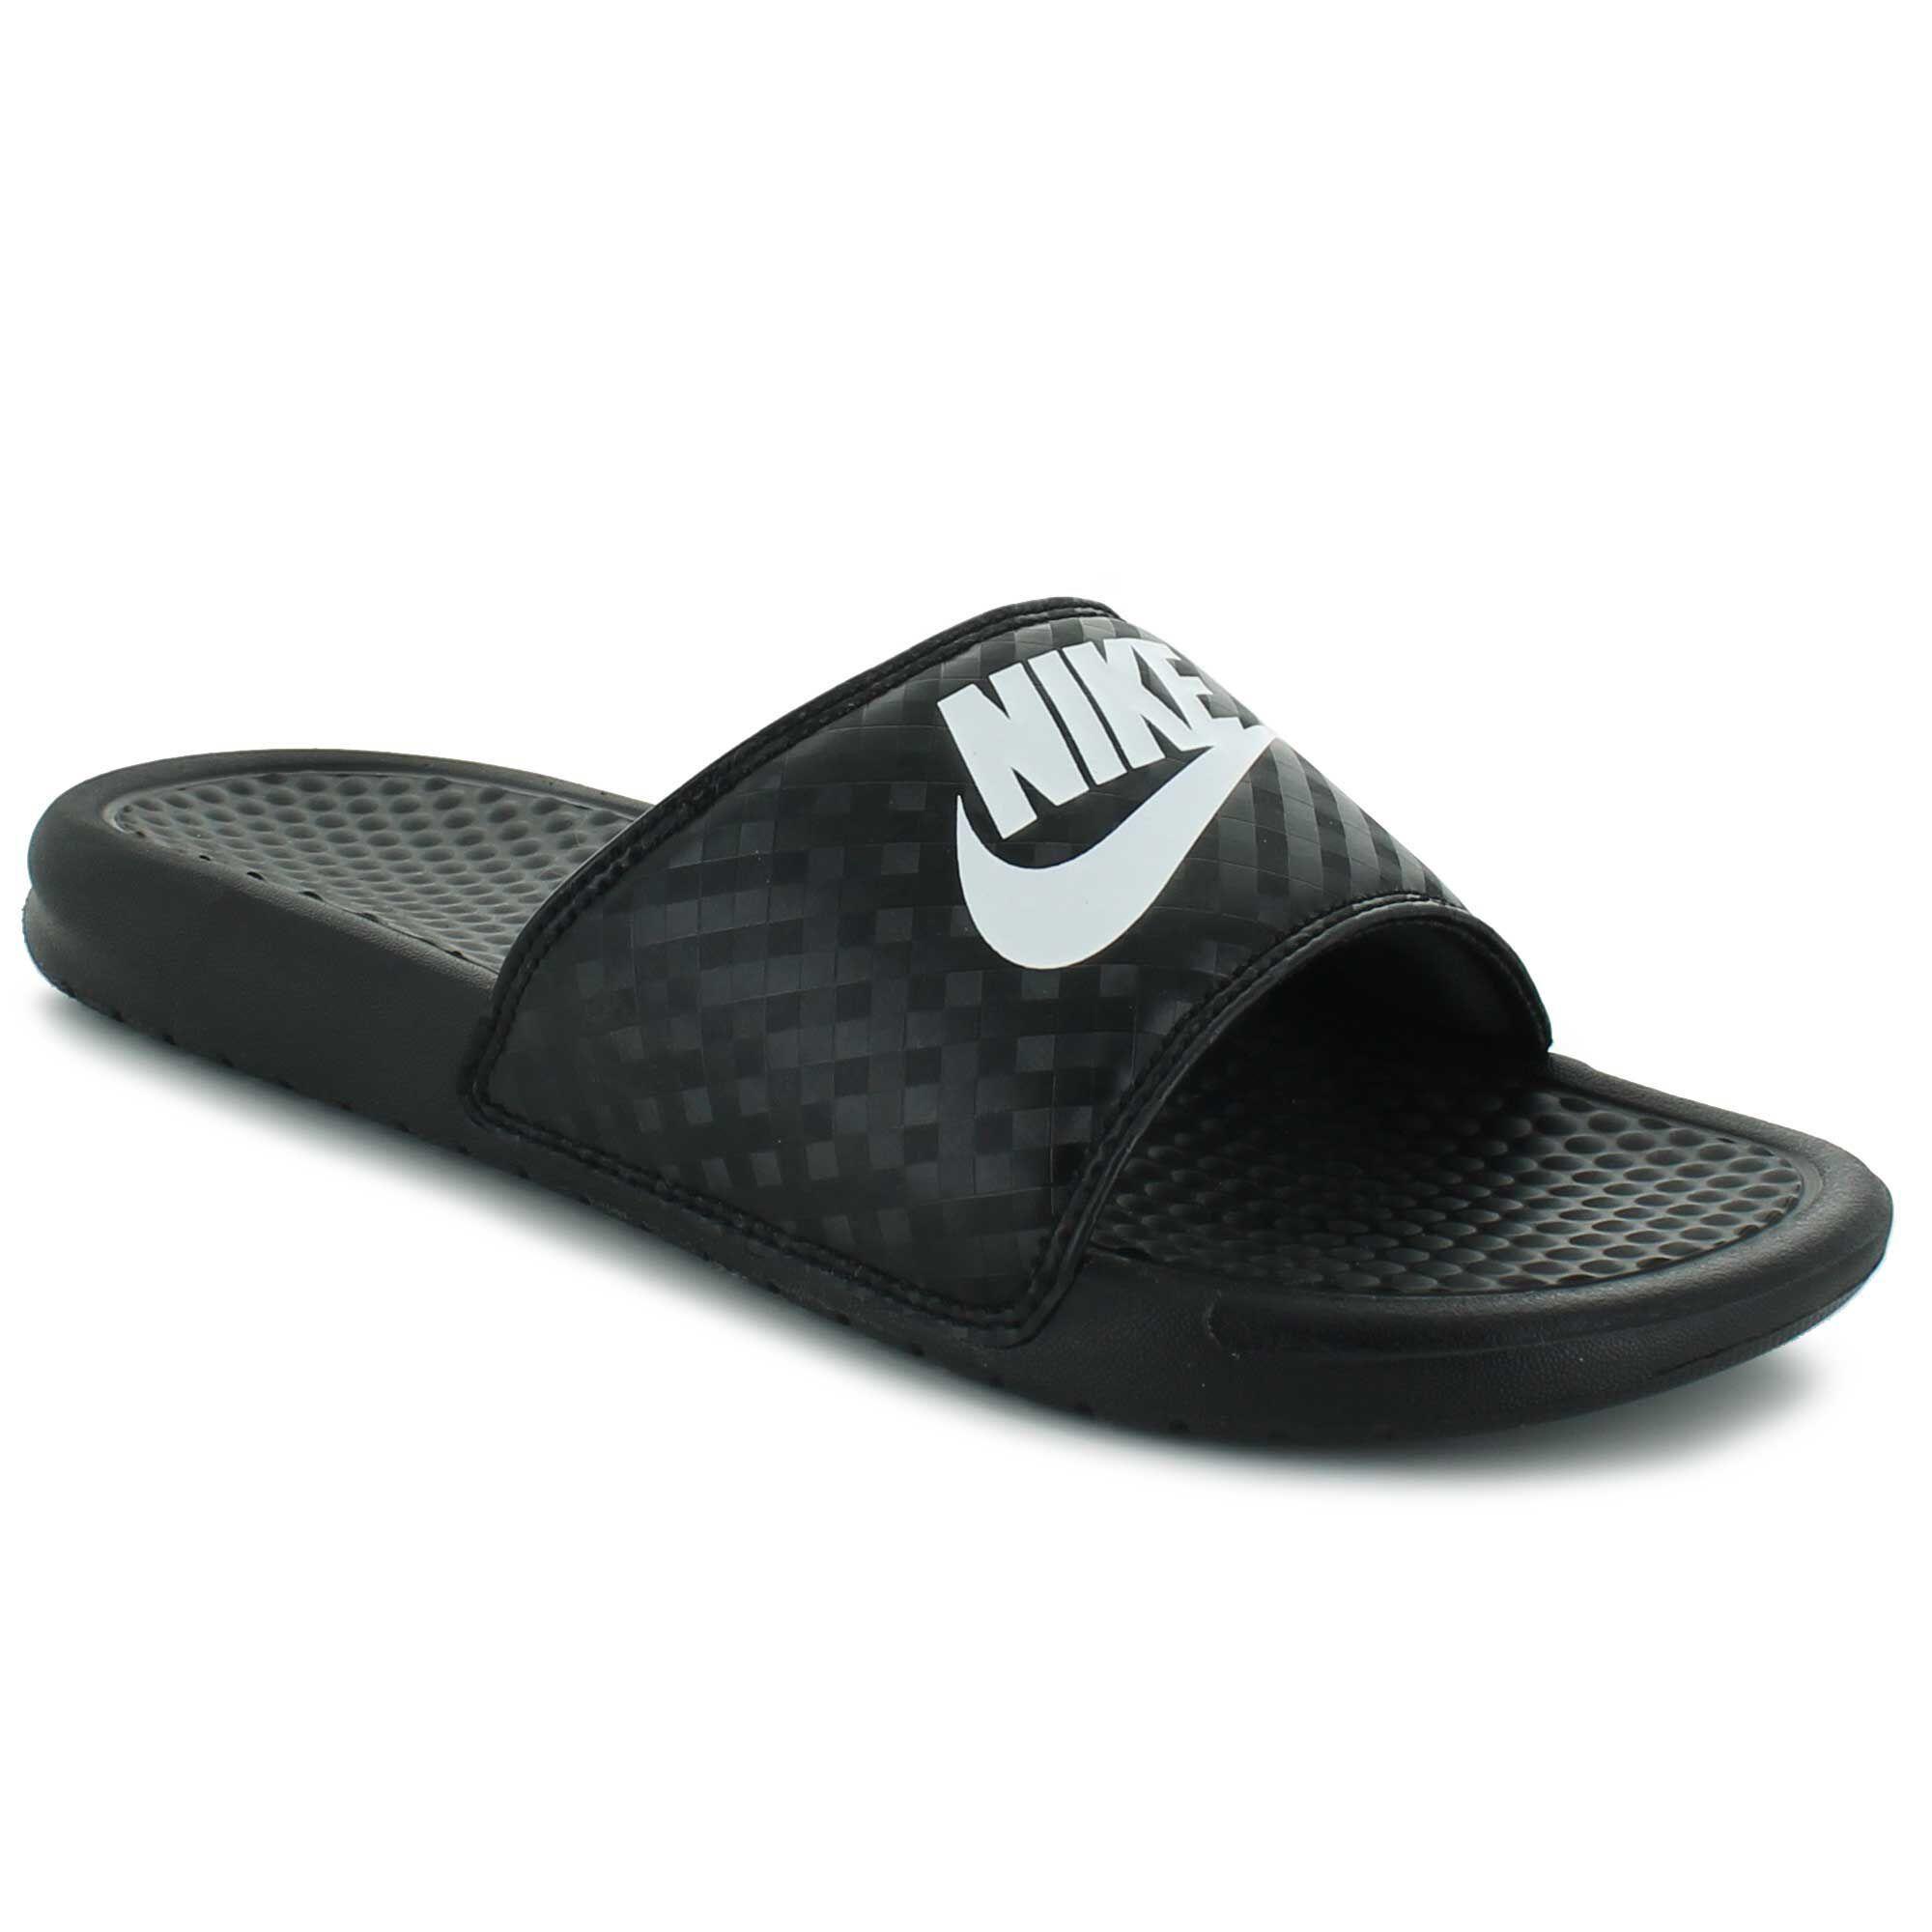 shoe dept nike